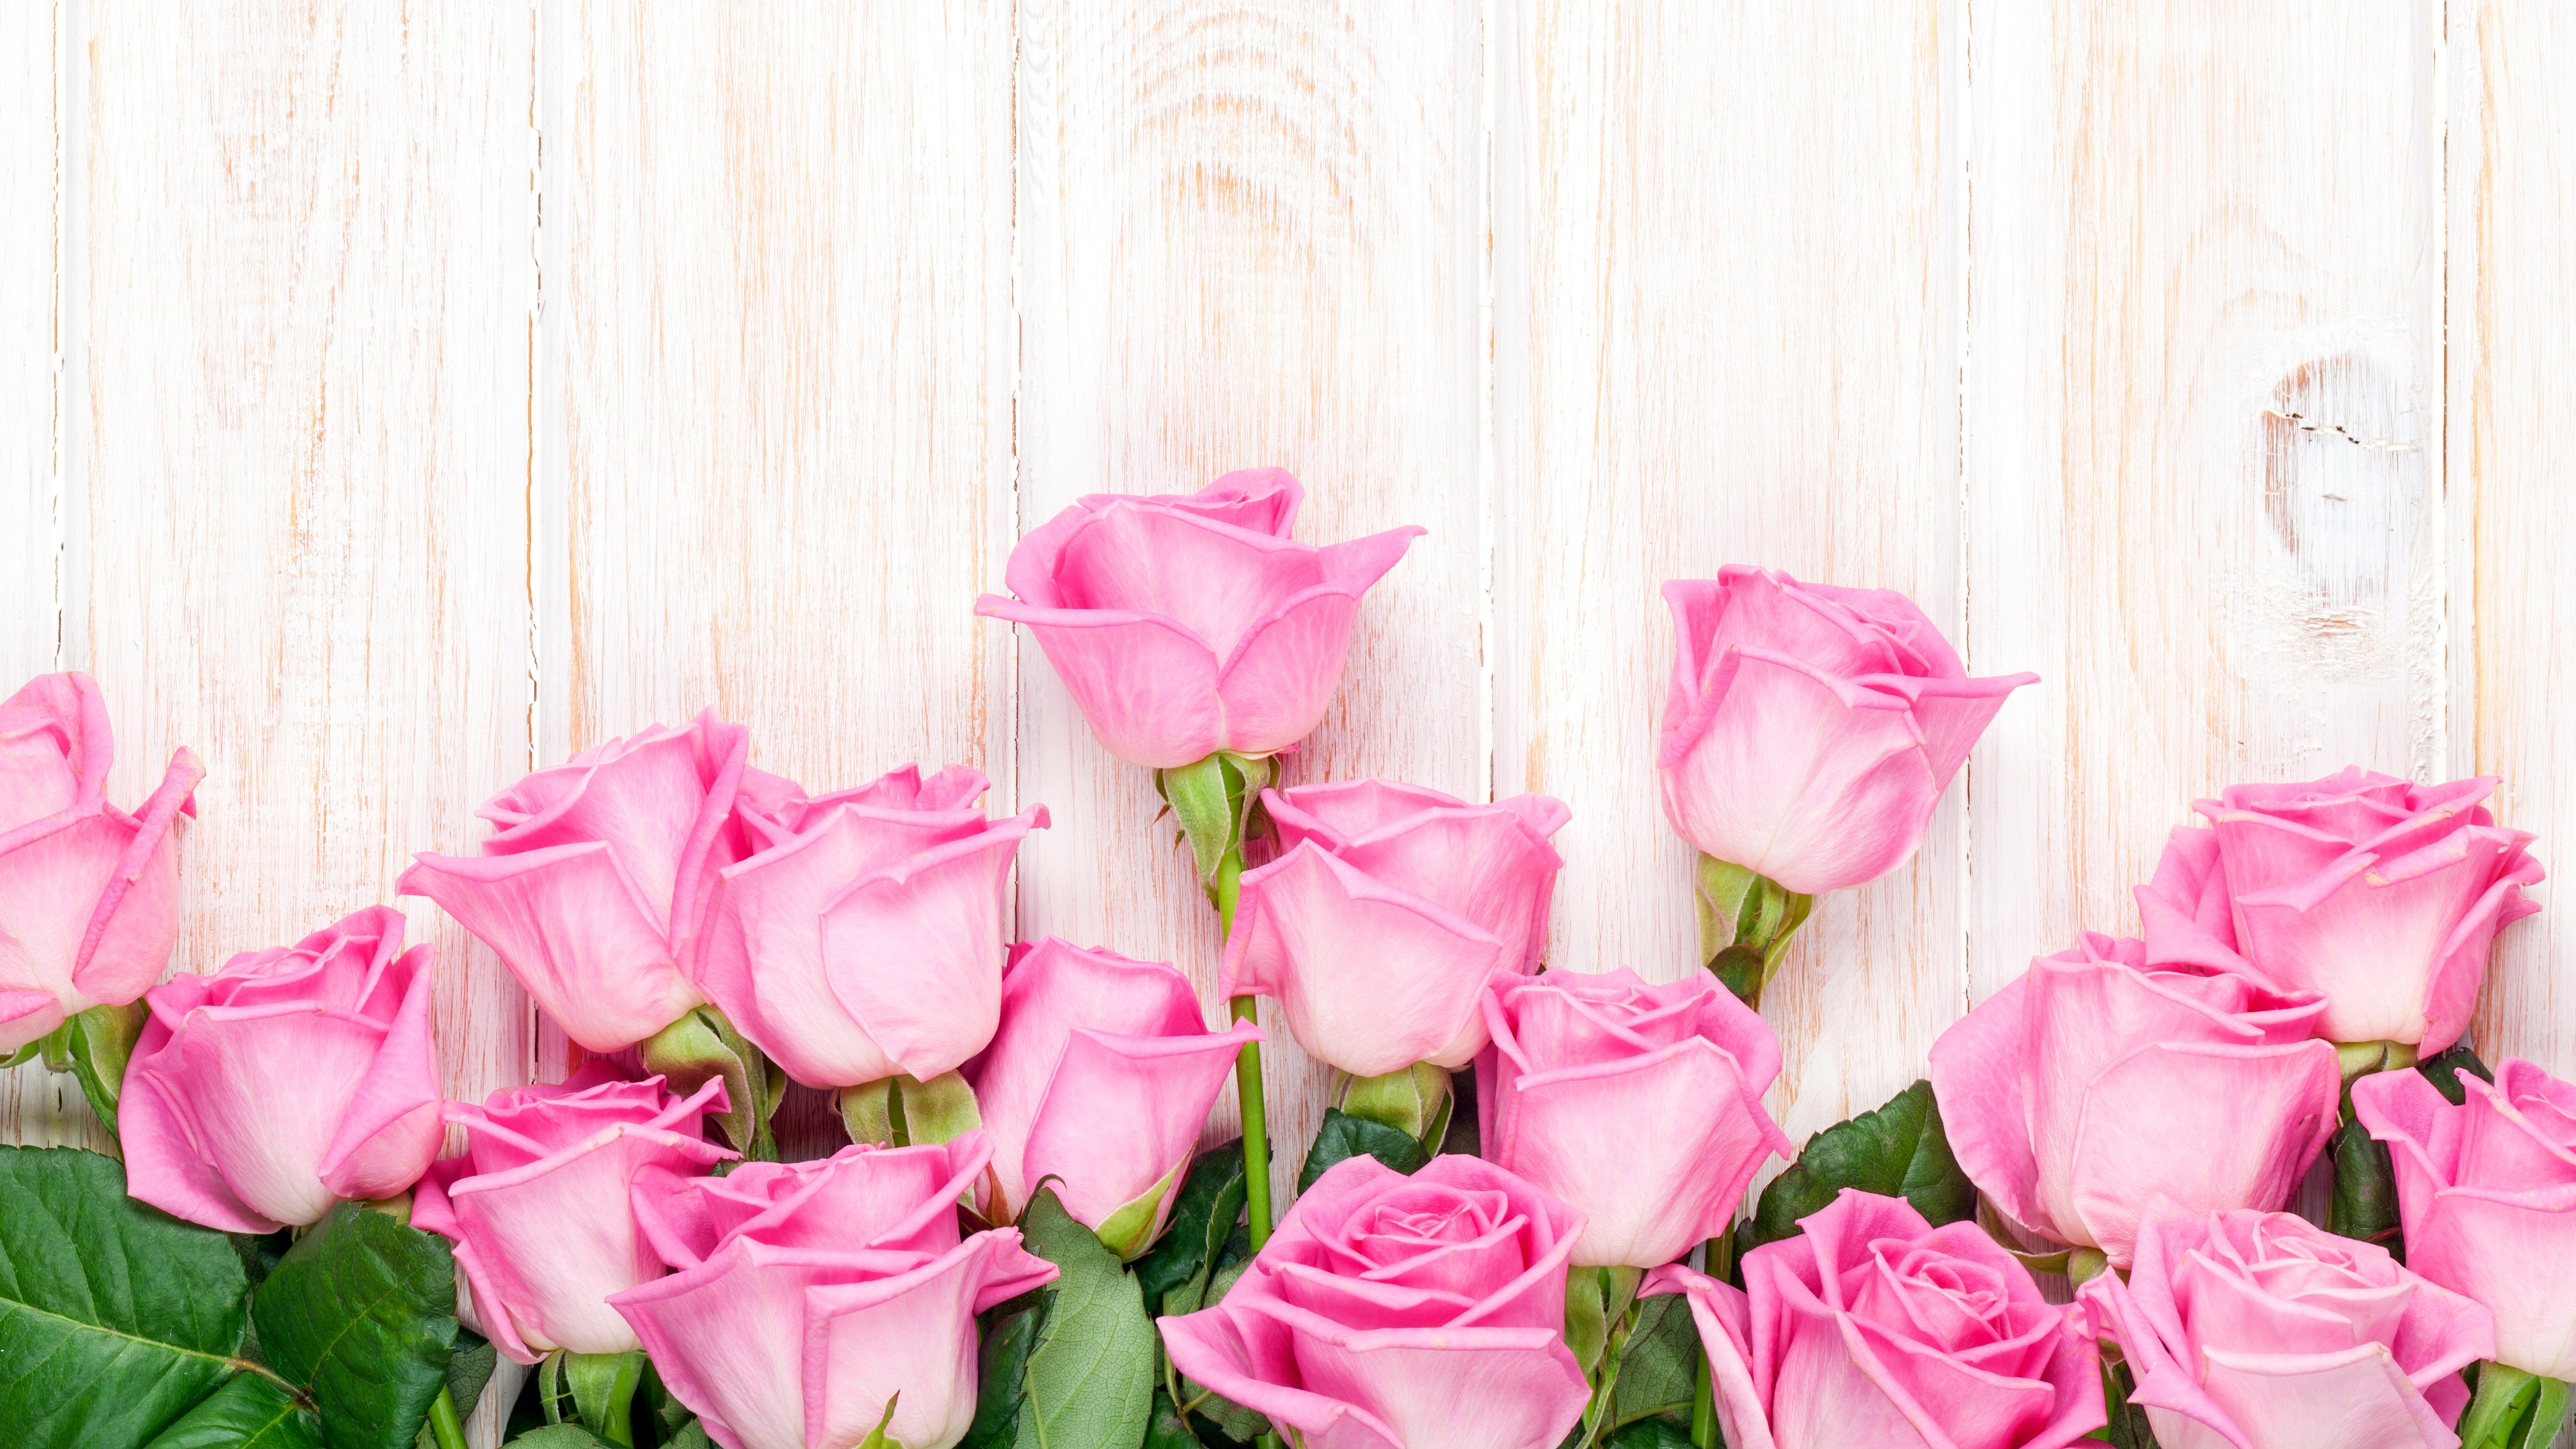 Fondos De Pantalla Rosa Rosa Flores, Fondo De Madera